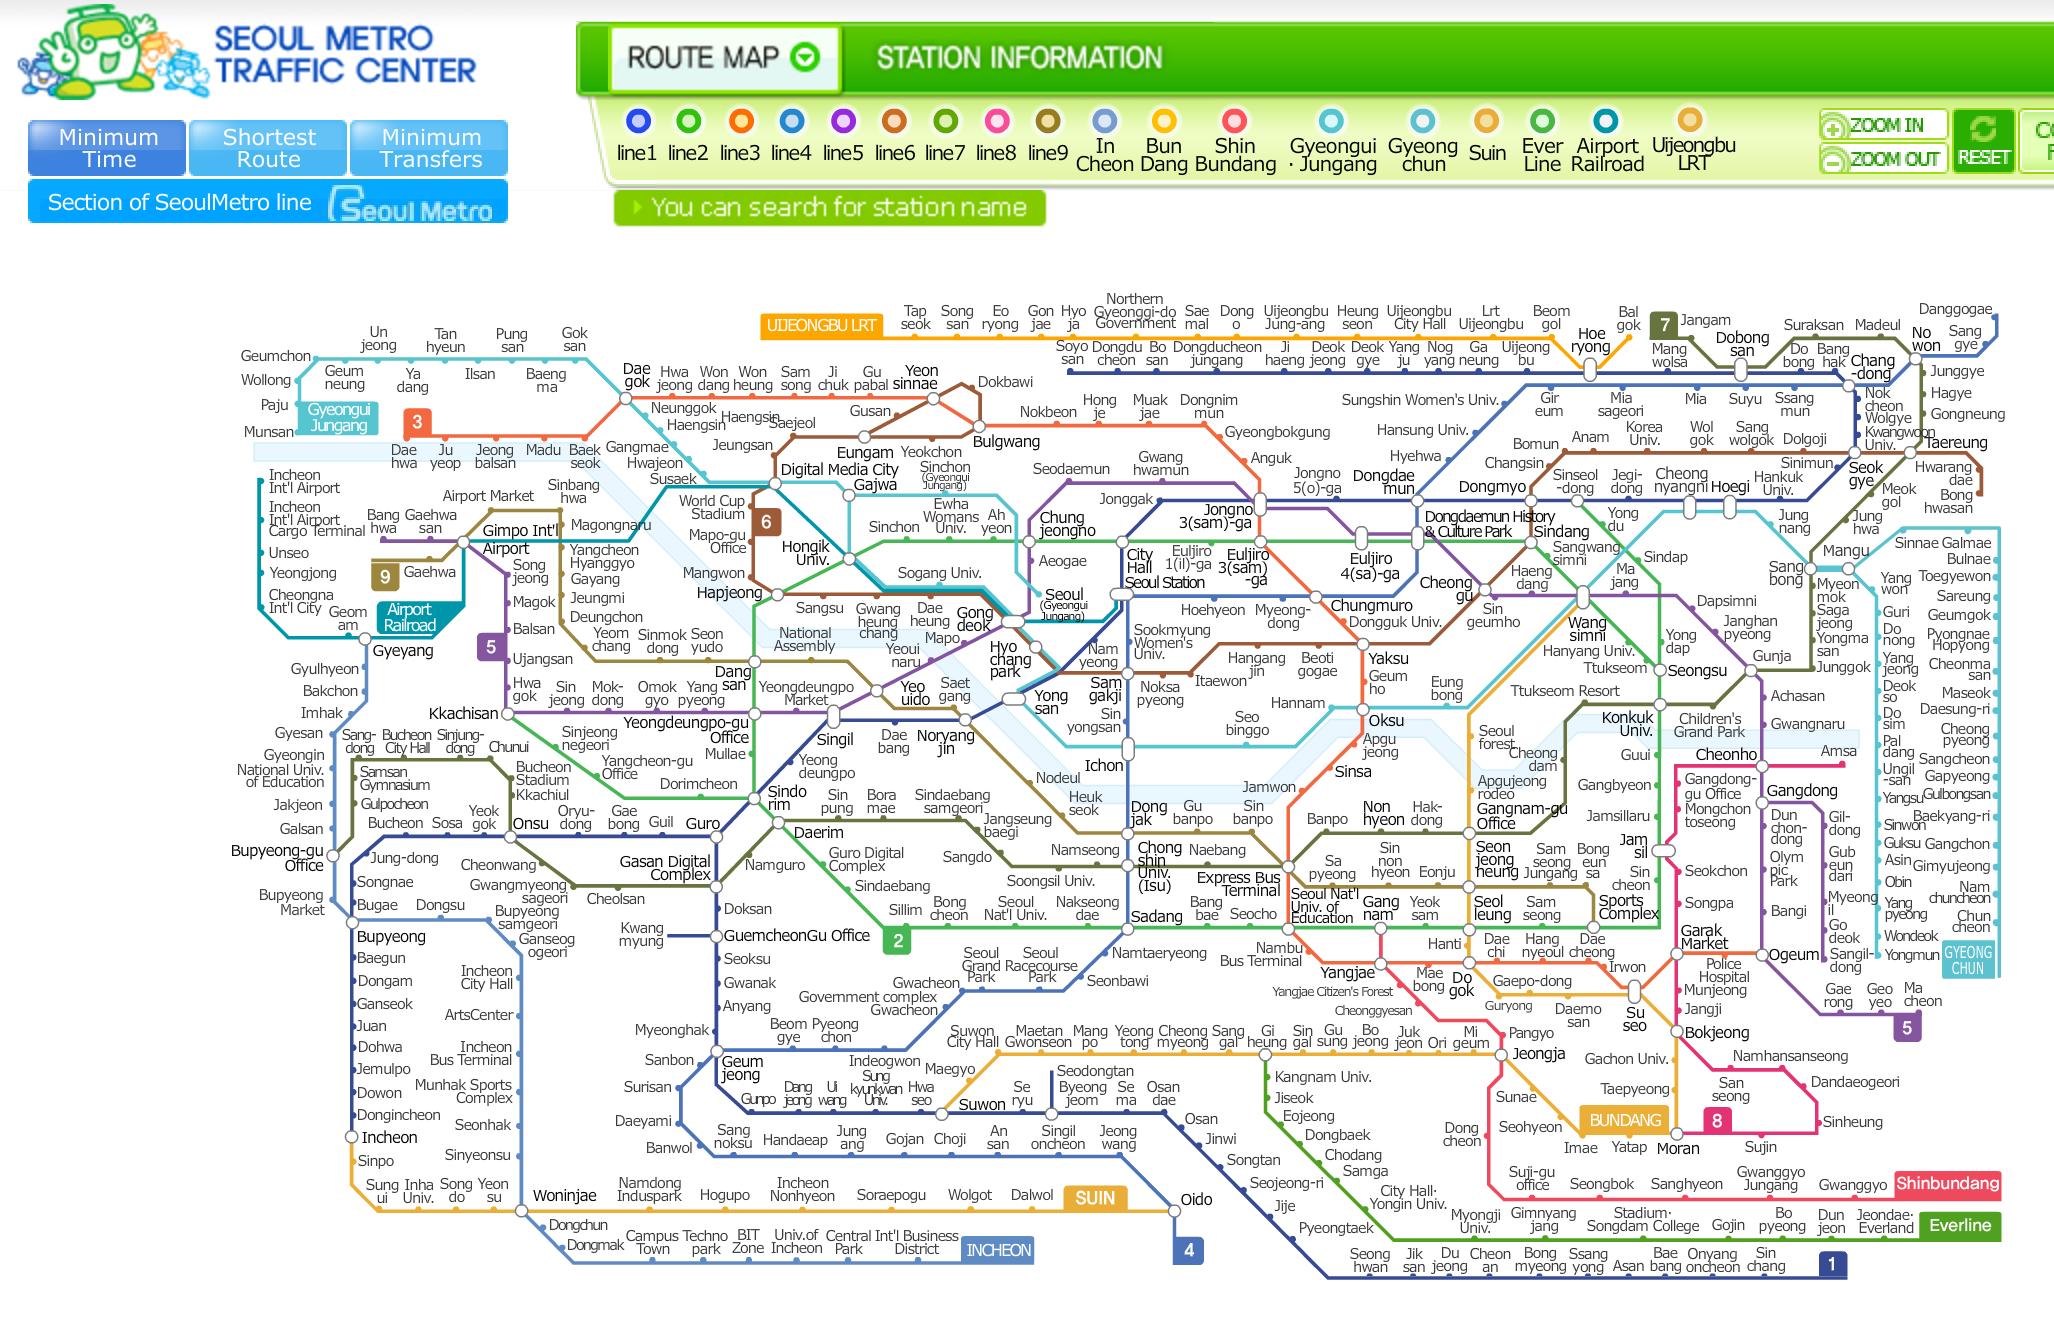 Seoul_Metro